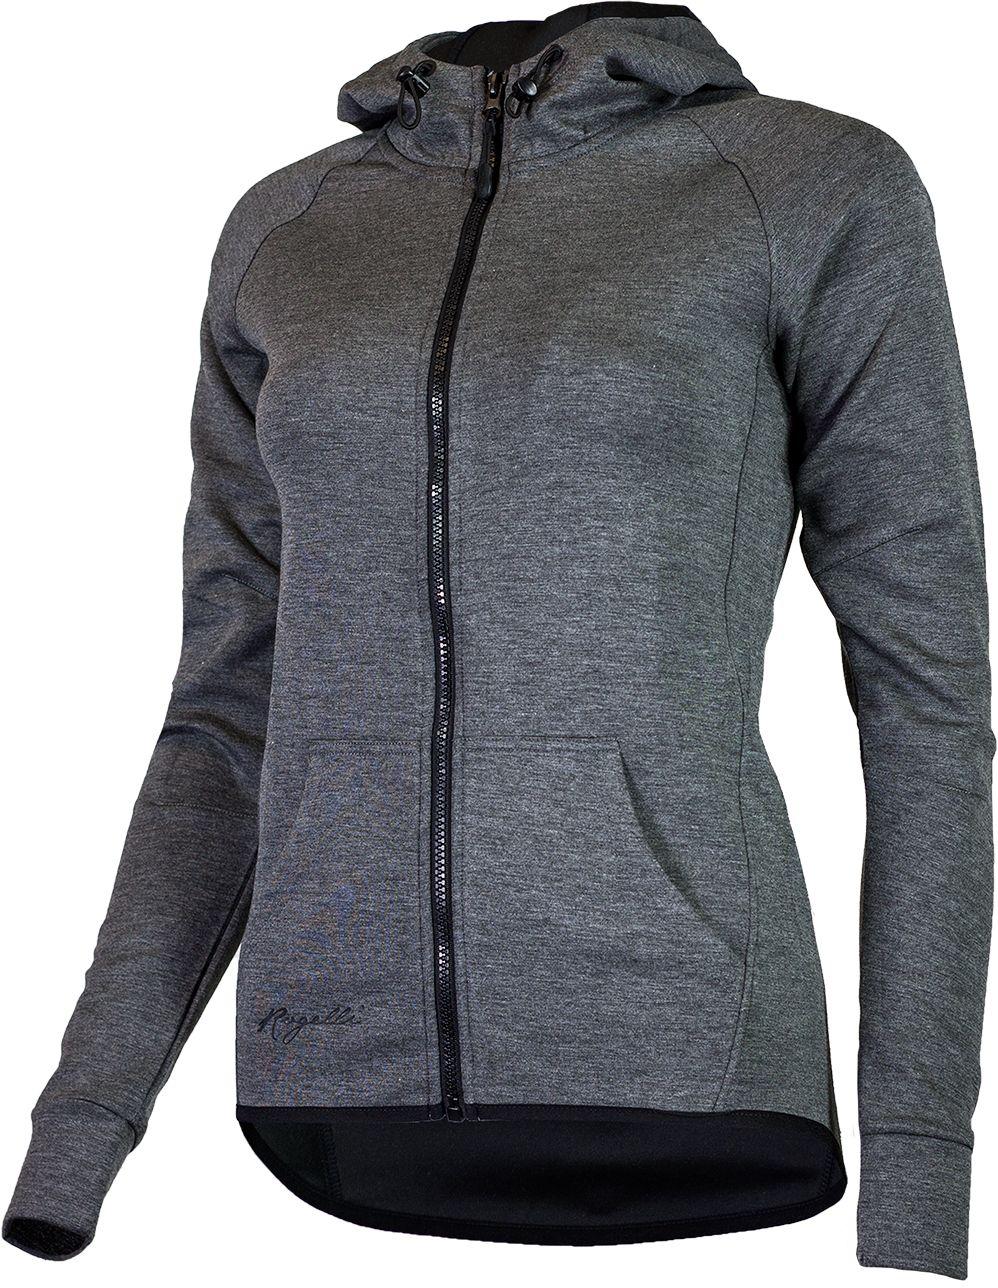 ROGELLI damska bluza z kapturem TRAINING szara Rozmiar: 2XL,050.609.XS